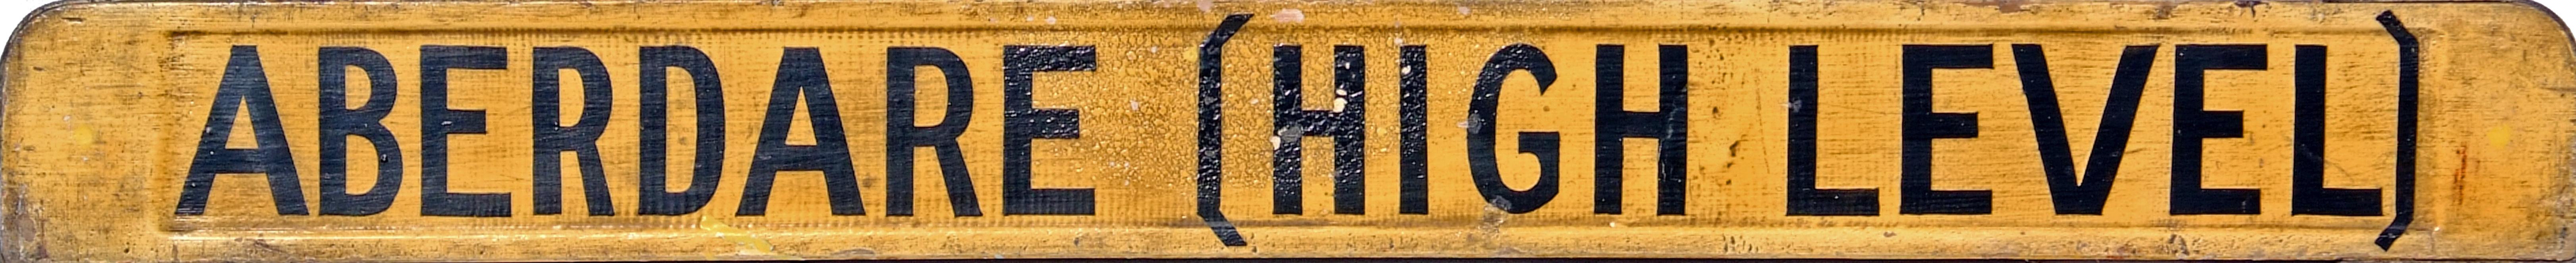 Carriage Board ABERDARE ([HIGH LEVEL] - SWANSEA